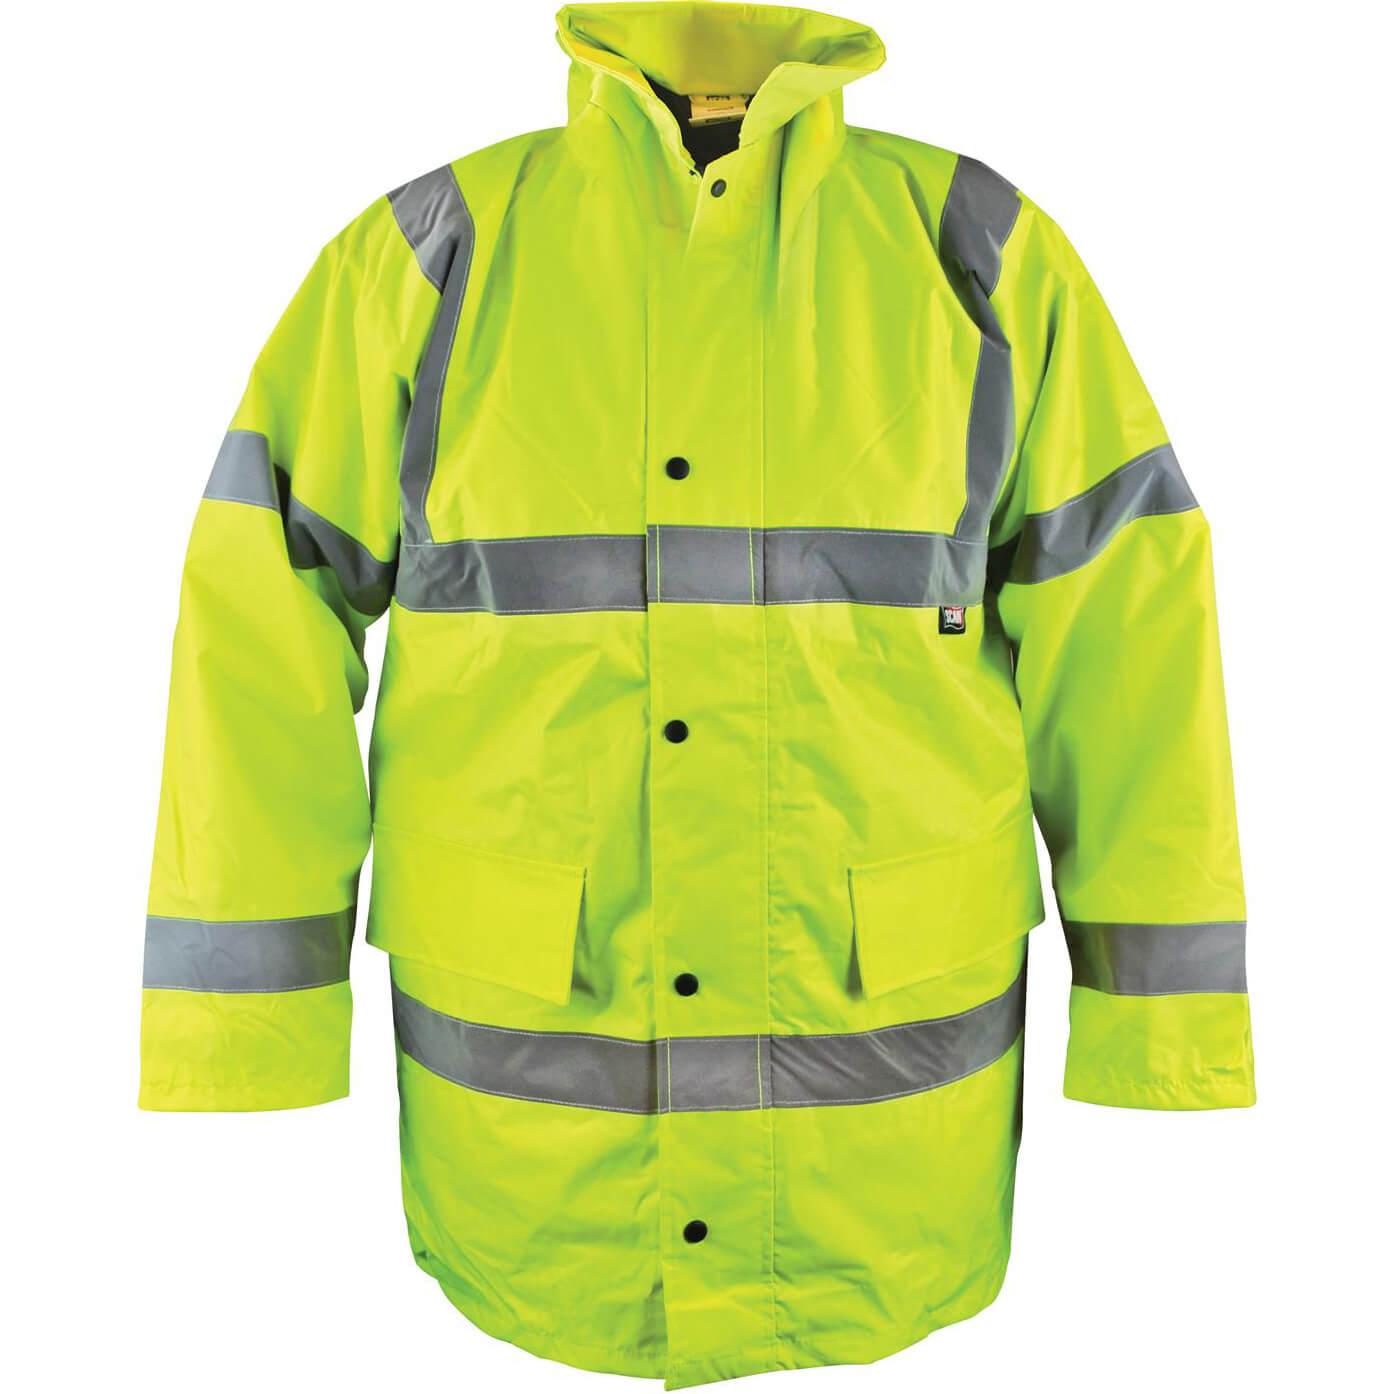 Image of Scan Hi Vis Motorway Jacket Yellow L